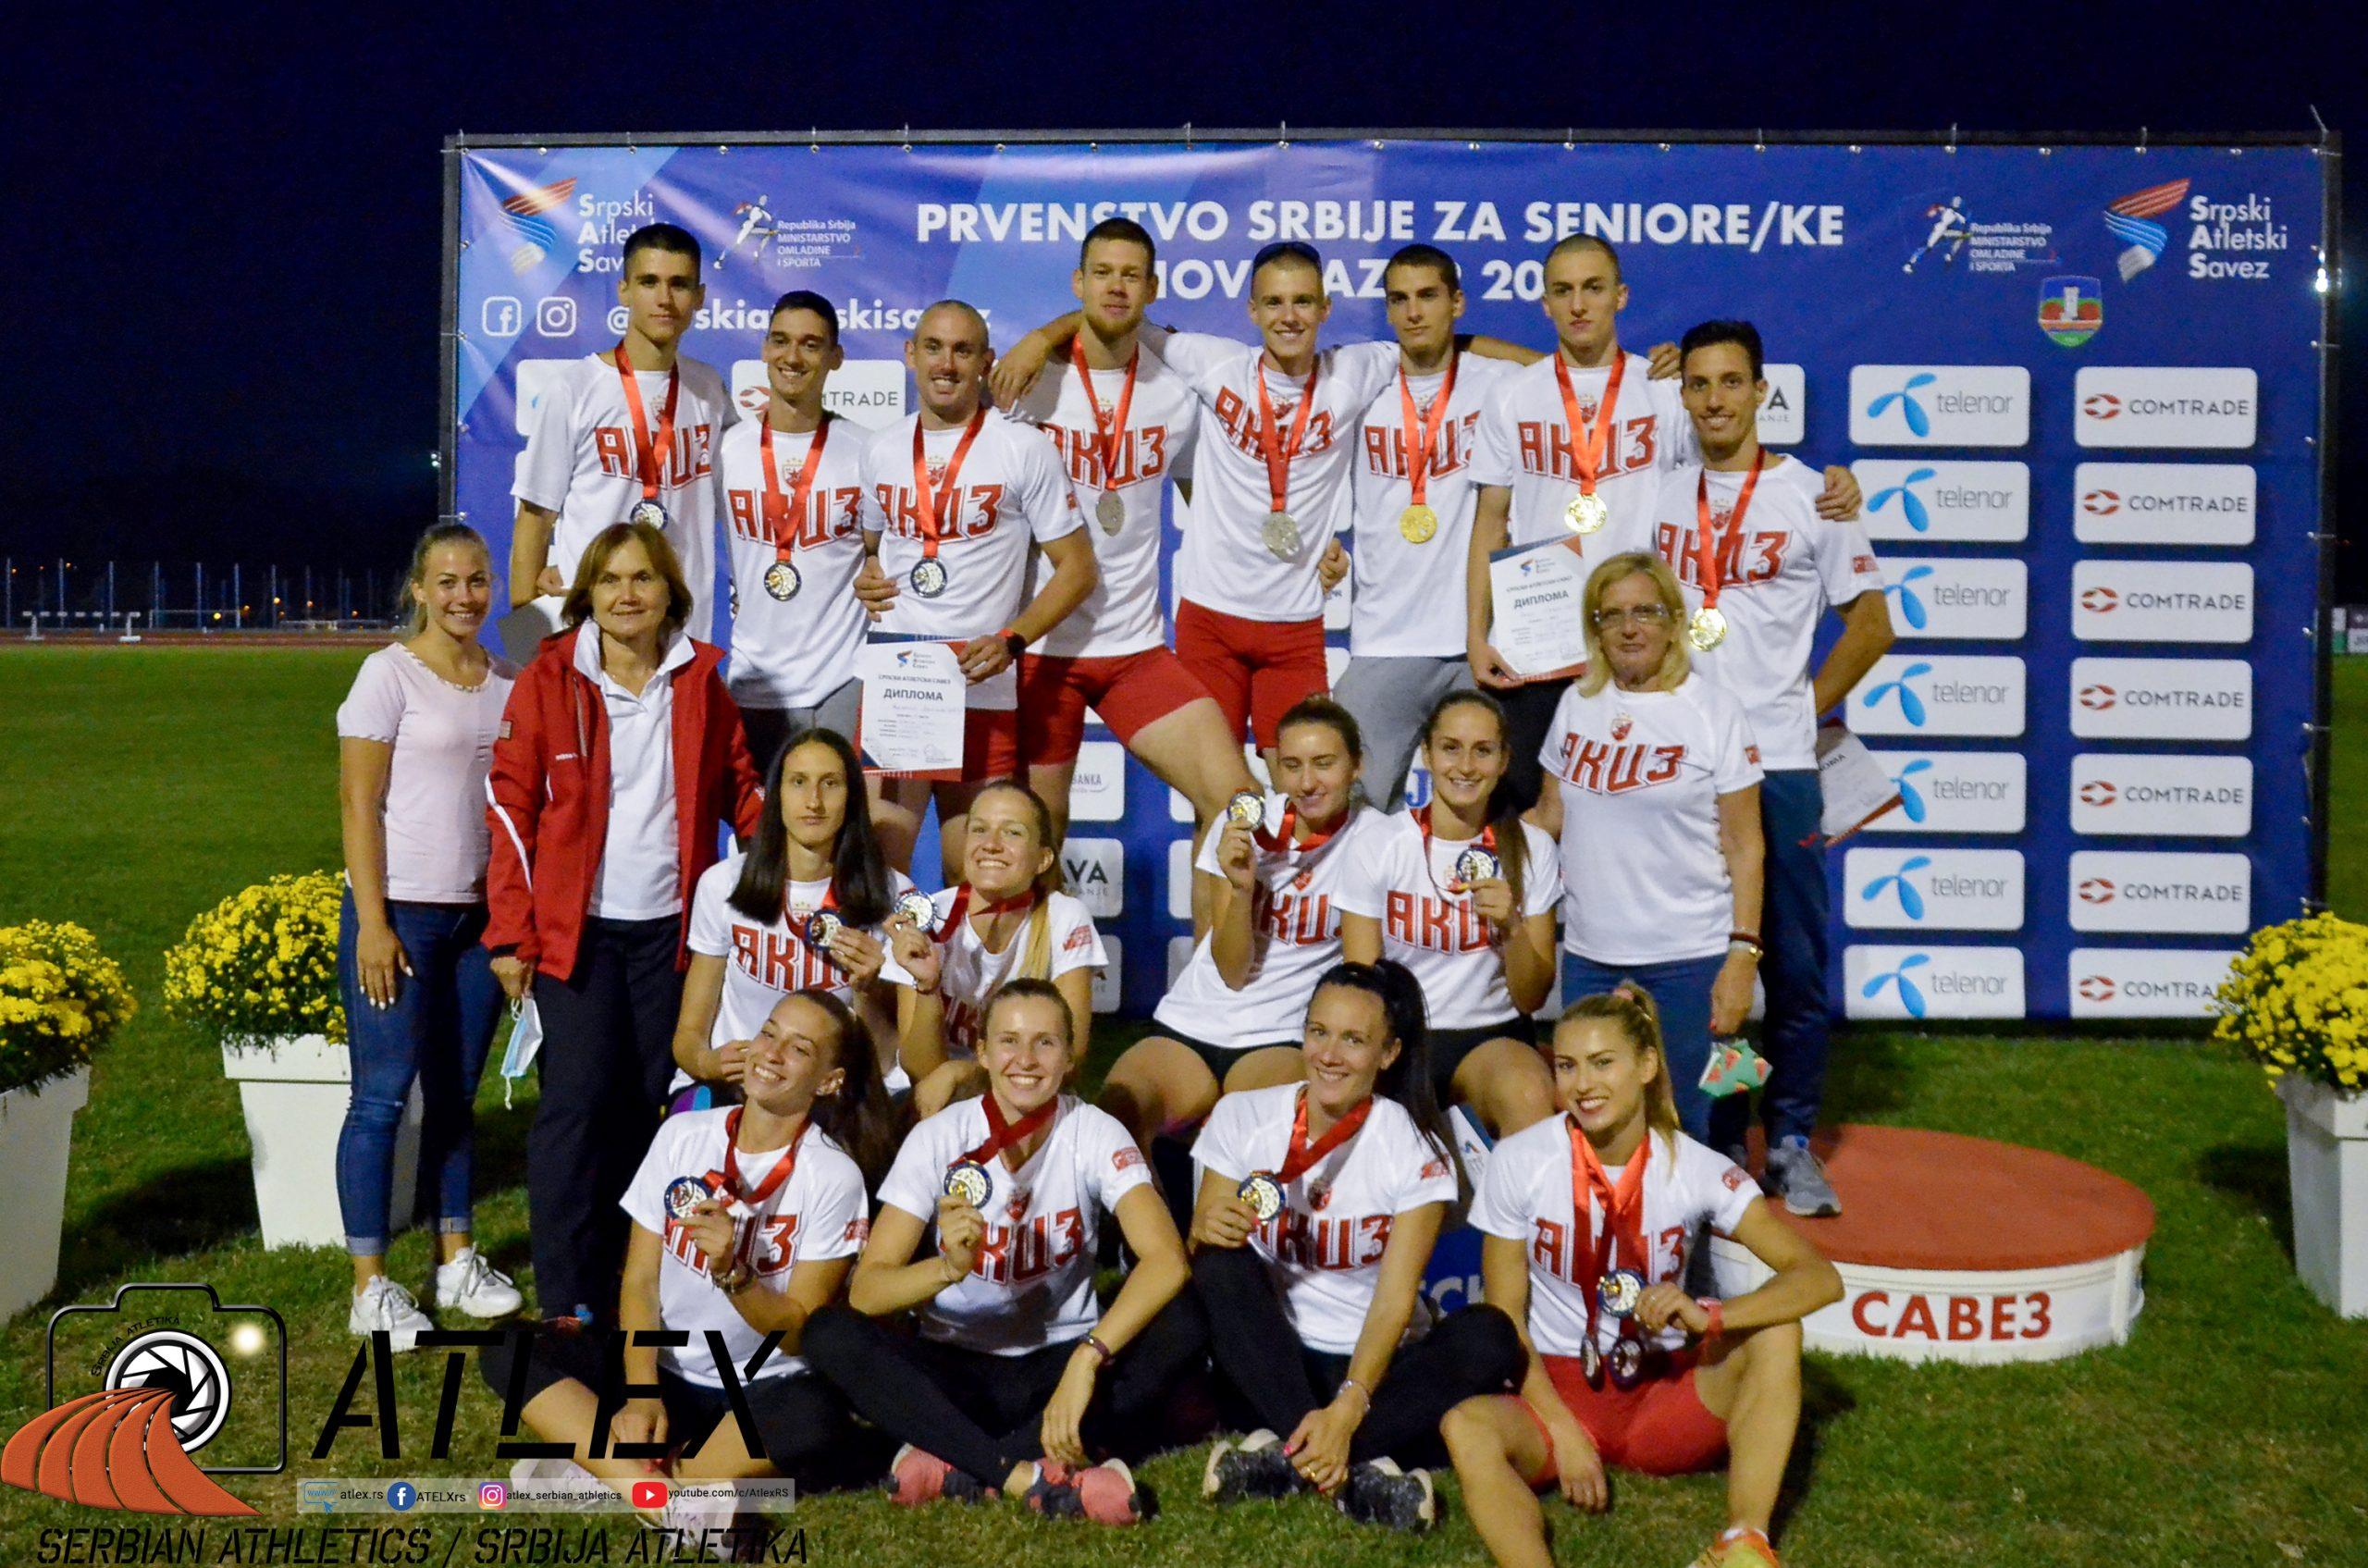 AK Crvena zvezda štafete 4x400m, prvenstvo Srbije 2020